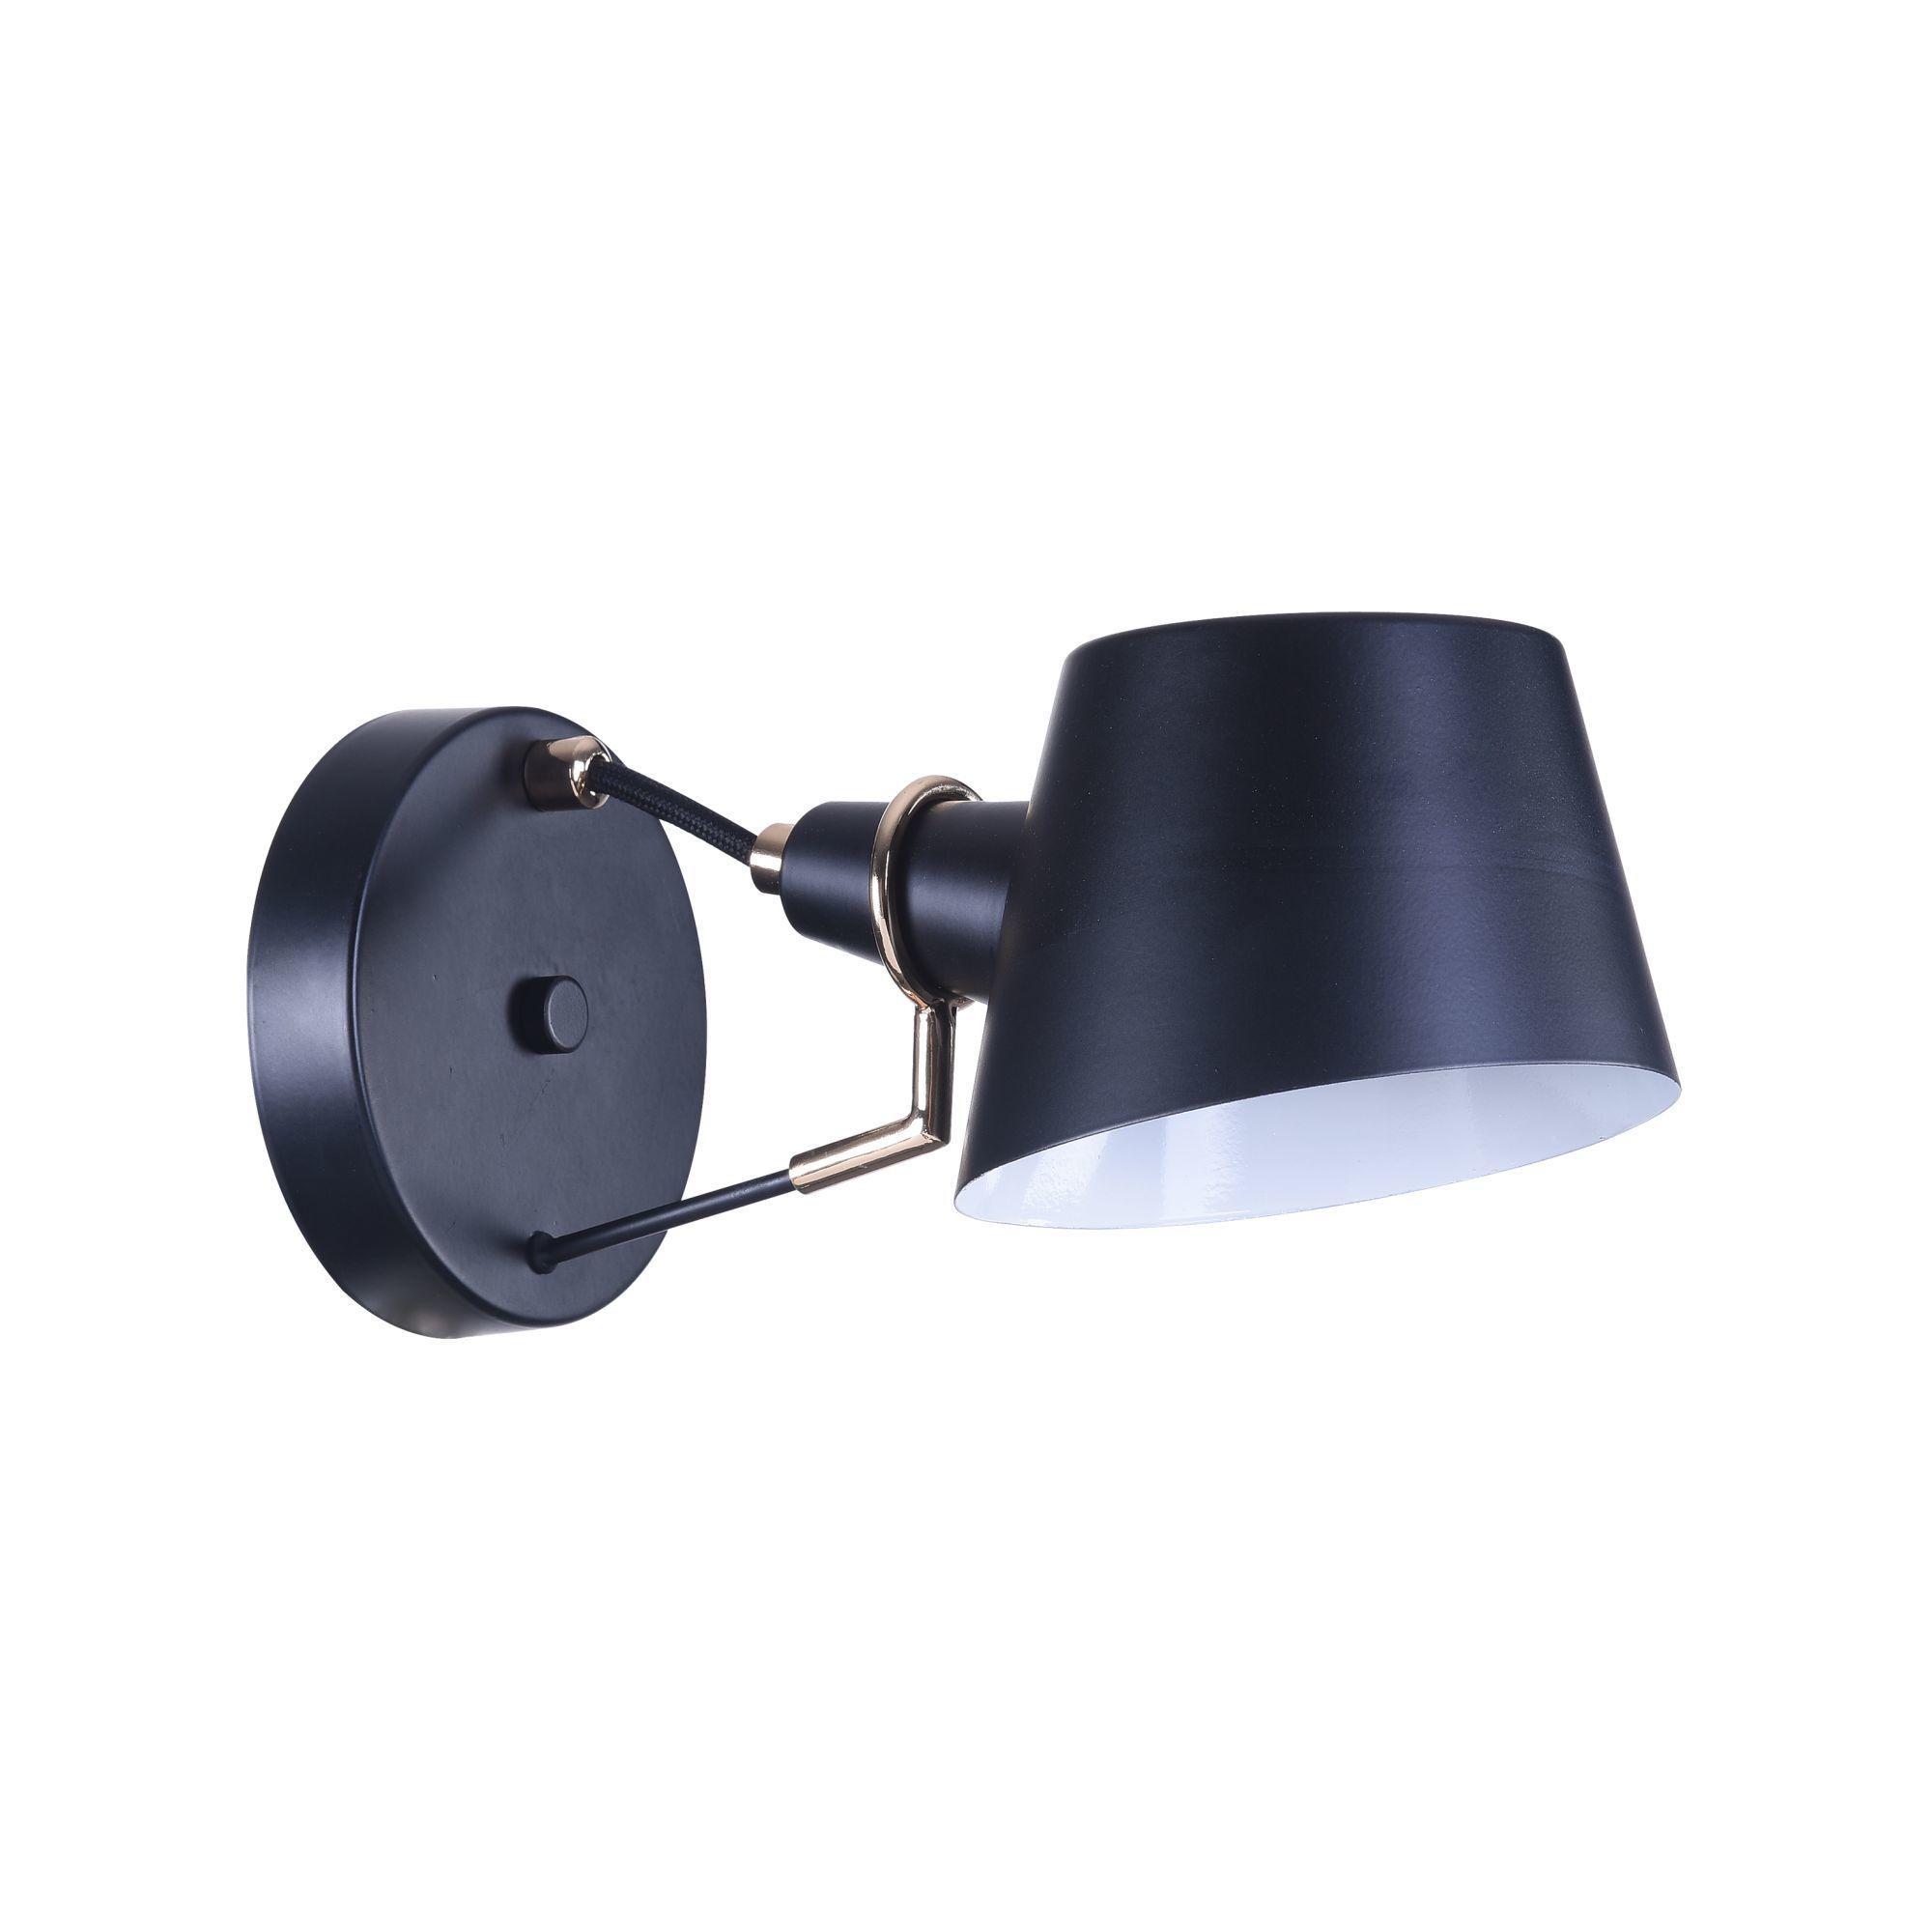 Бра Freya Abigail FR5038-WL-01-B, 1xE14x40W, черный, металл - фото 2